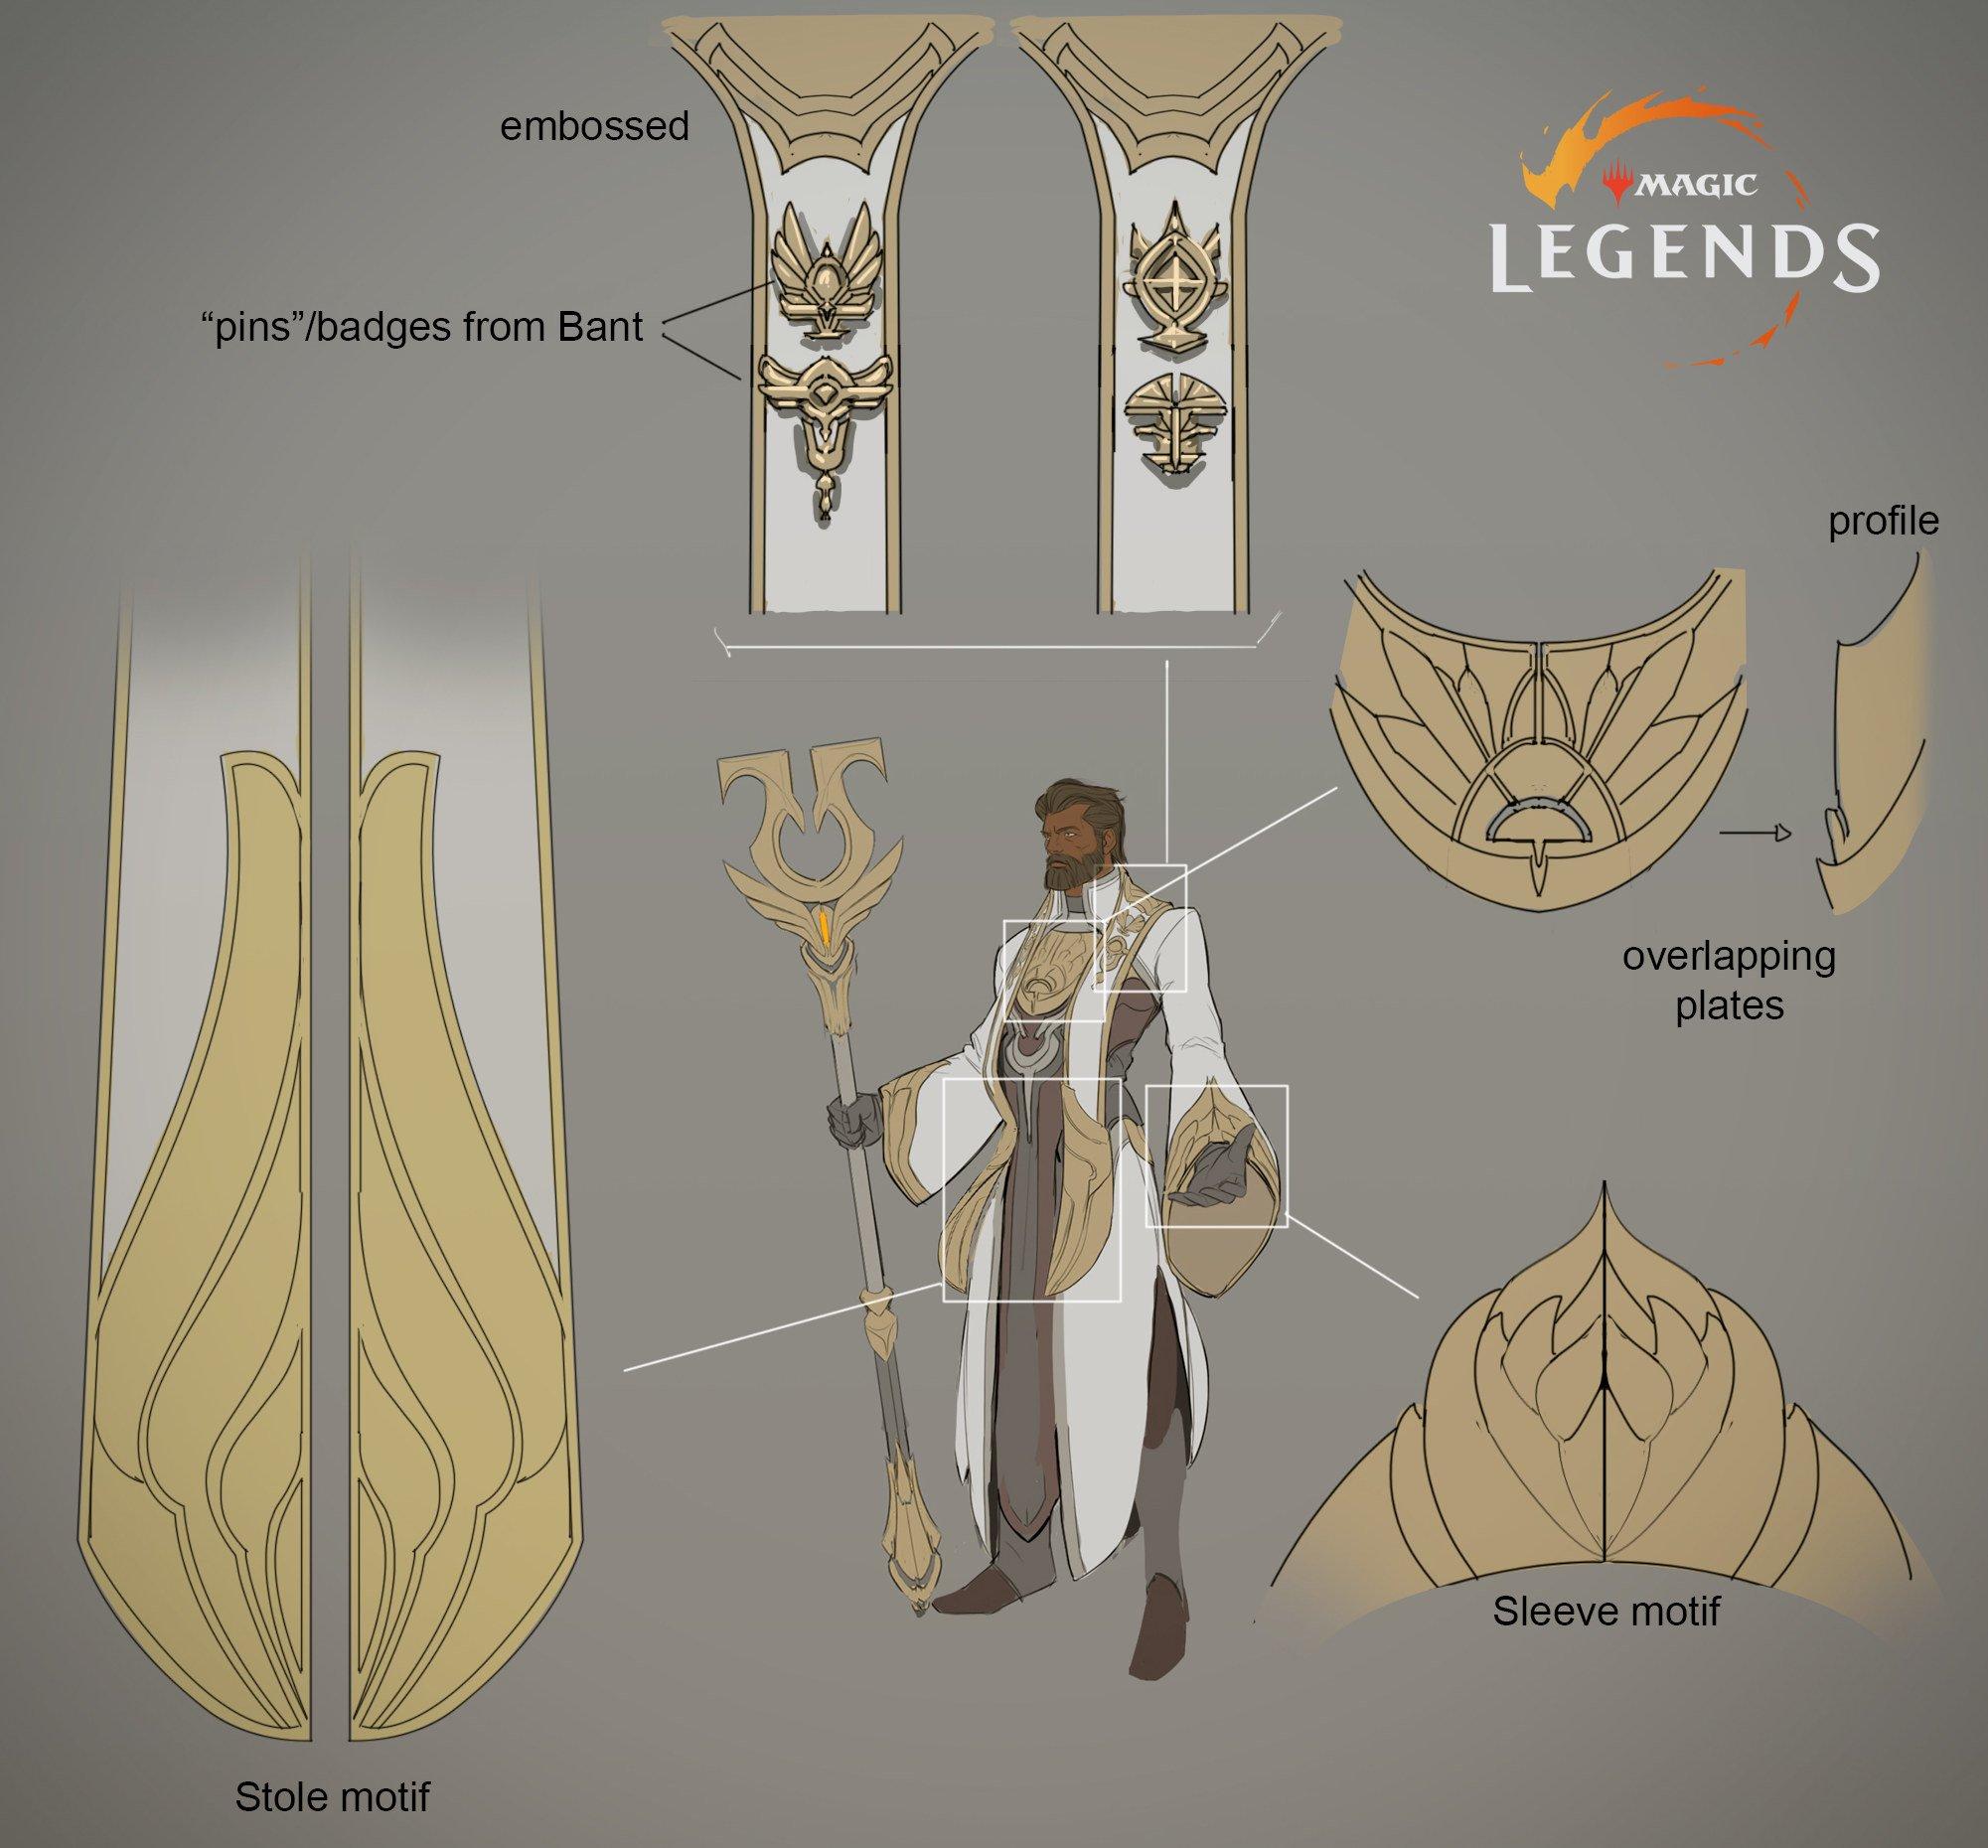 Magic Legends Santifier nuova classe PLaneswalker bianco concept art Magic: Legends